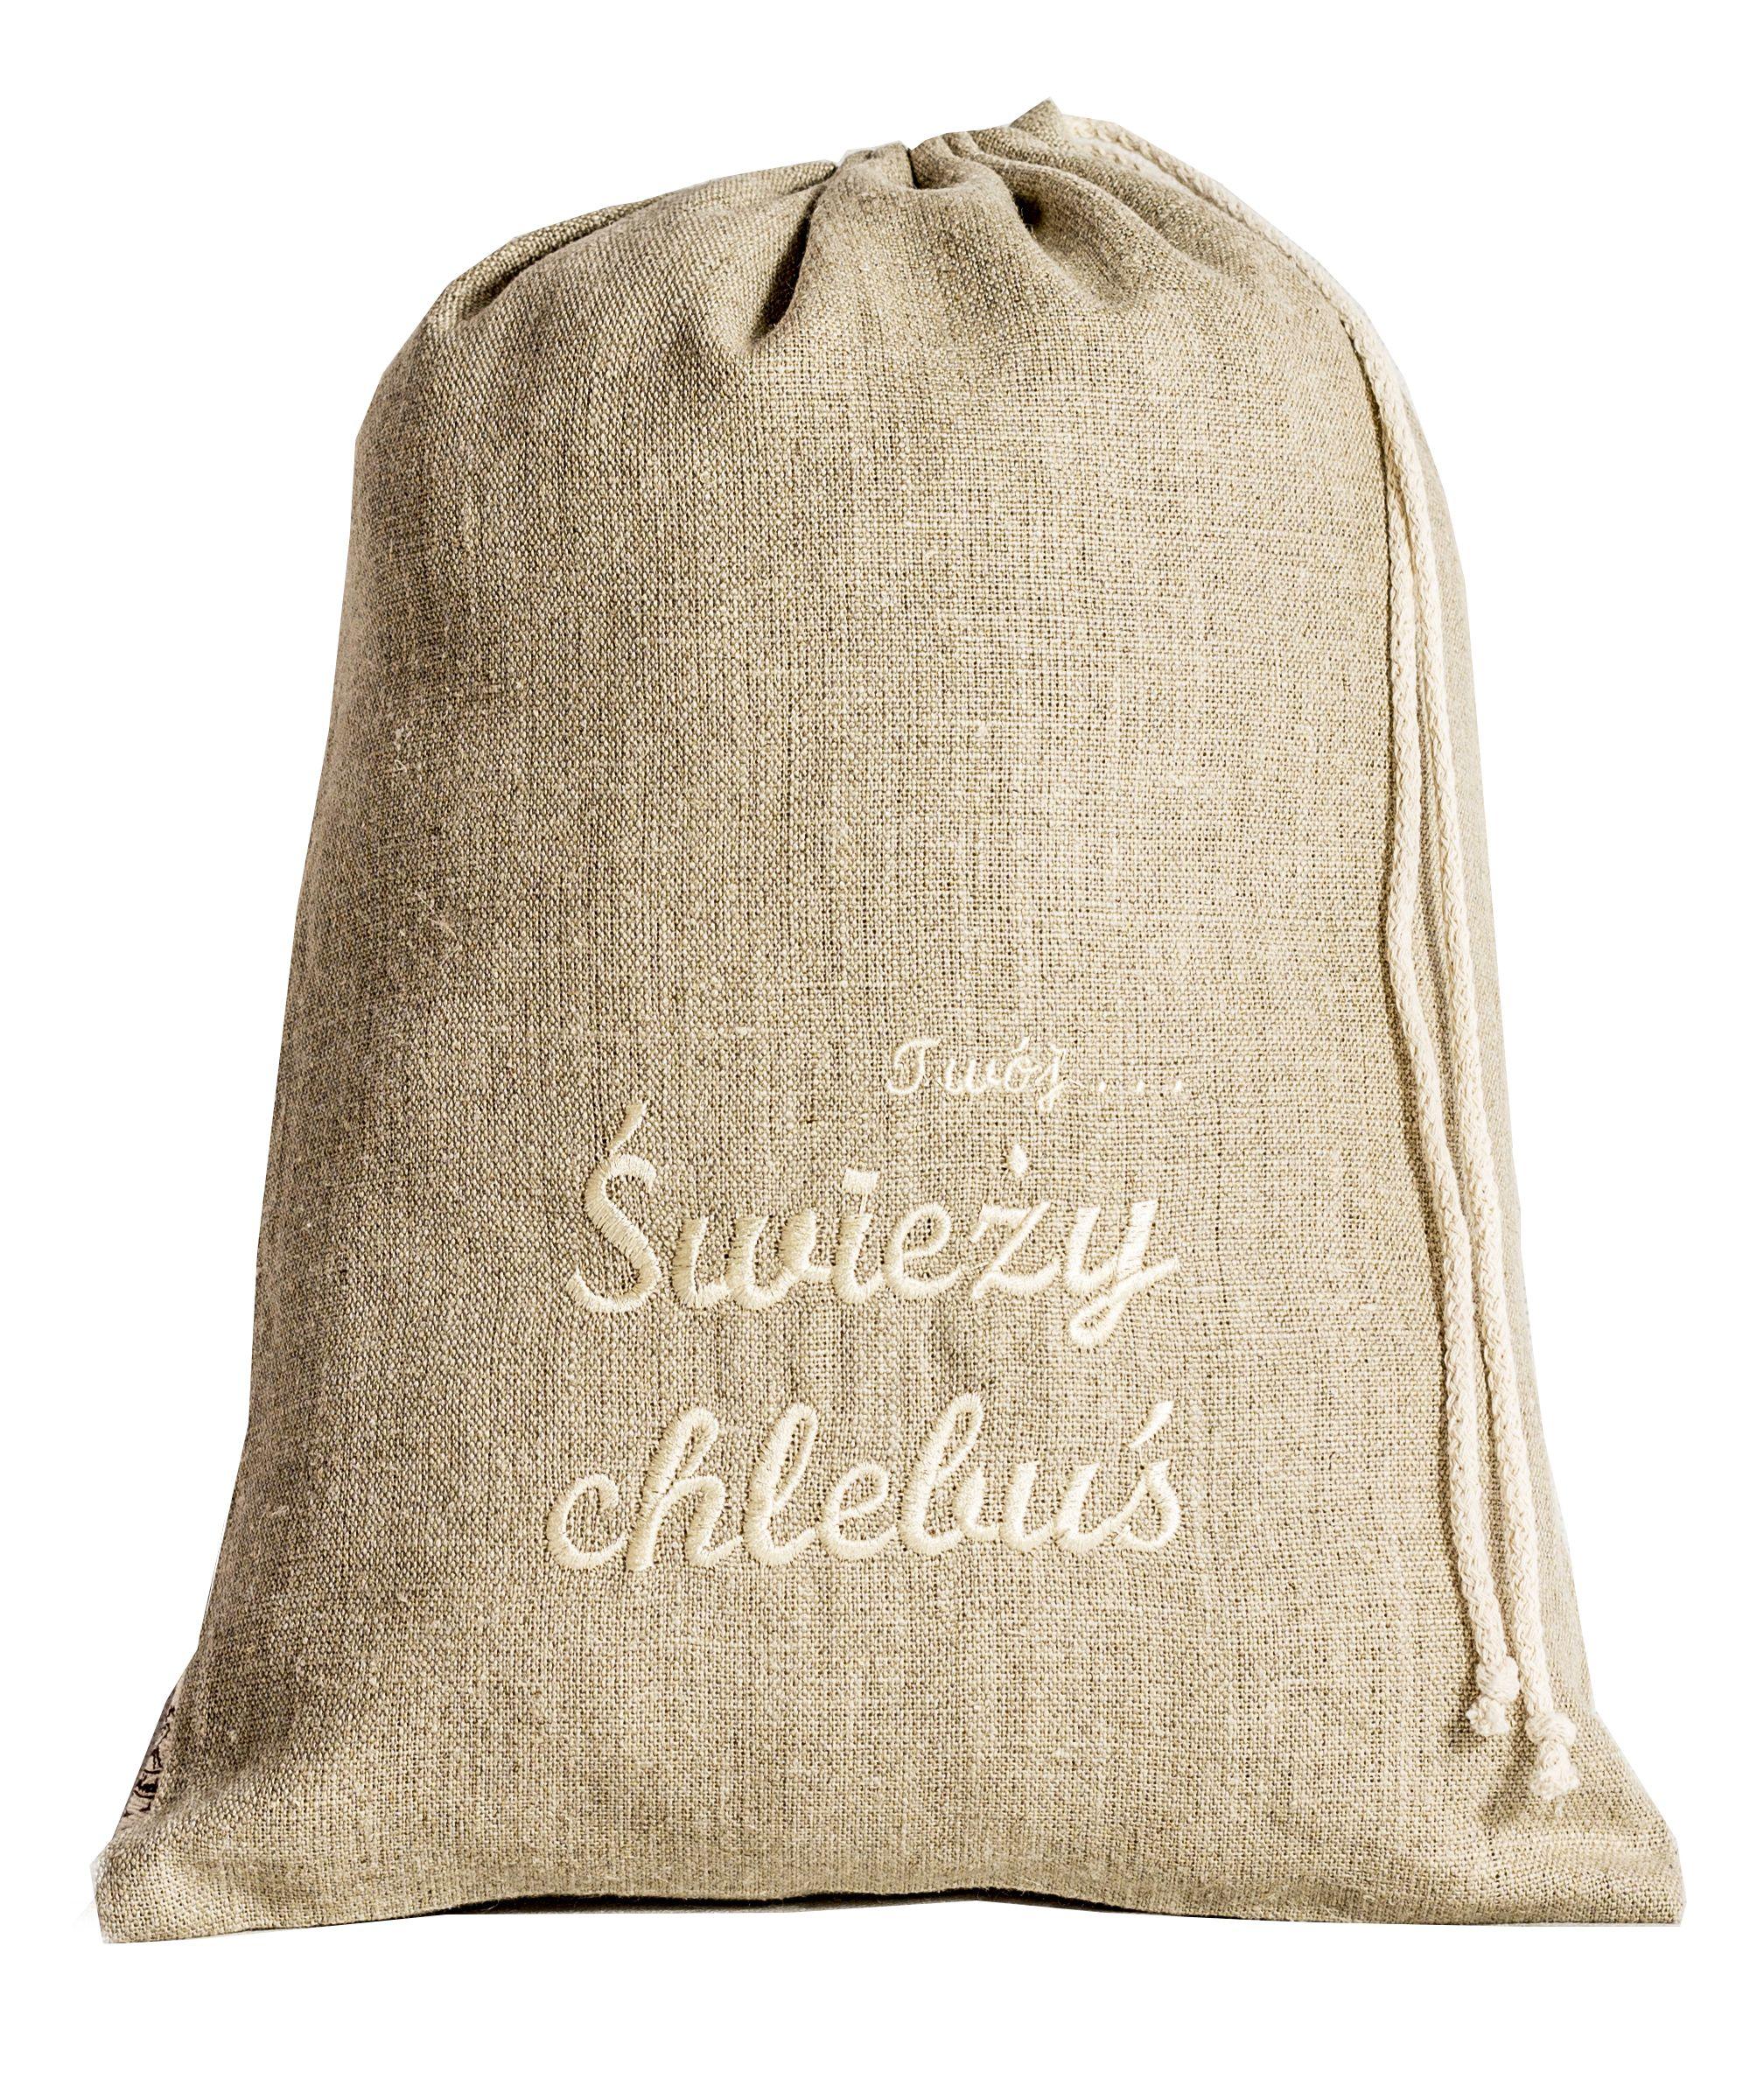 Lniany Worek Do Chleba Twoj Swiezy Chlebus Haft Ecru Jute Bags Wholesale Gift Bags Small Jute Bags